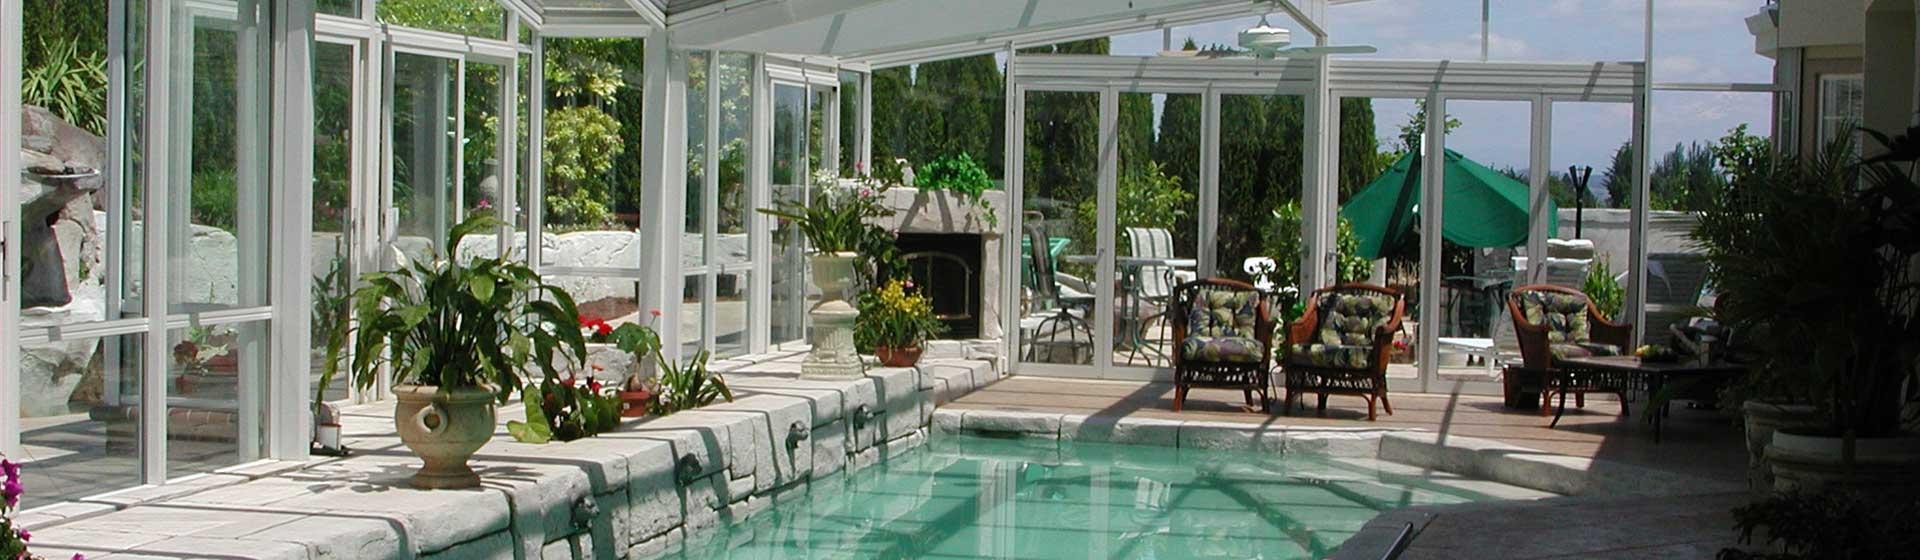 pool-spa-enclosures